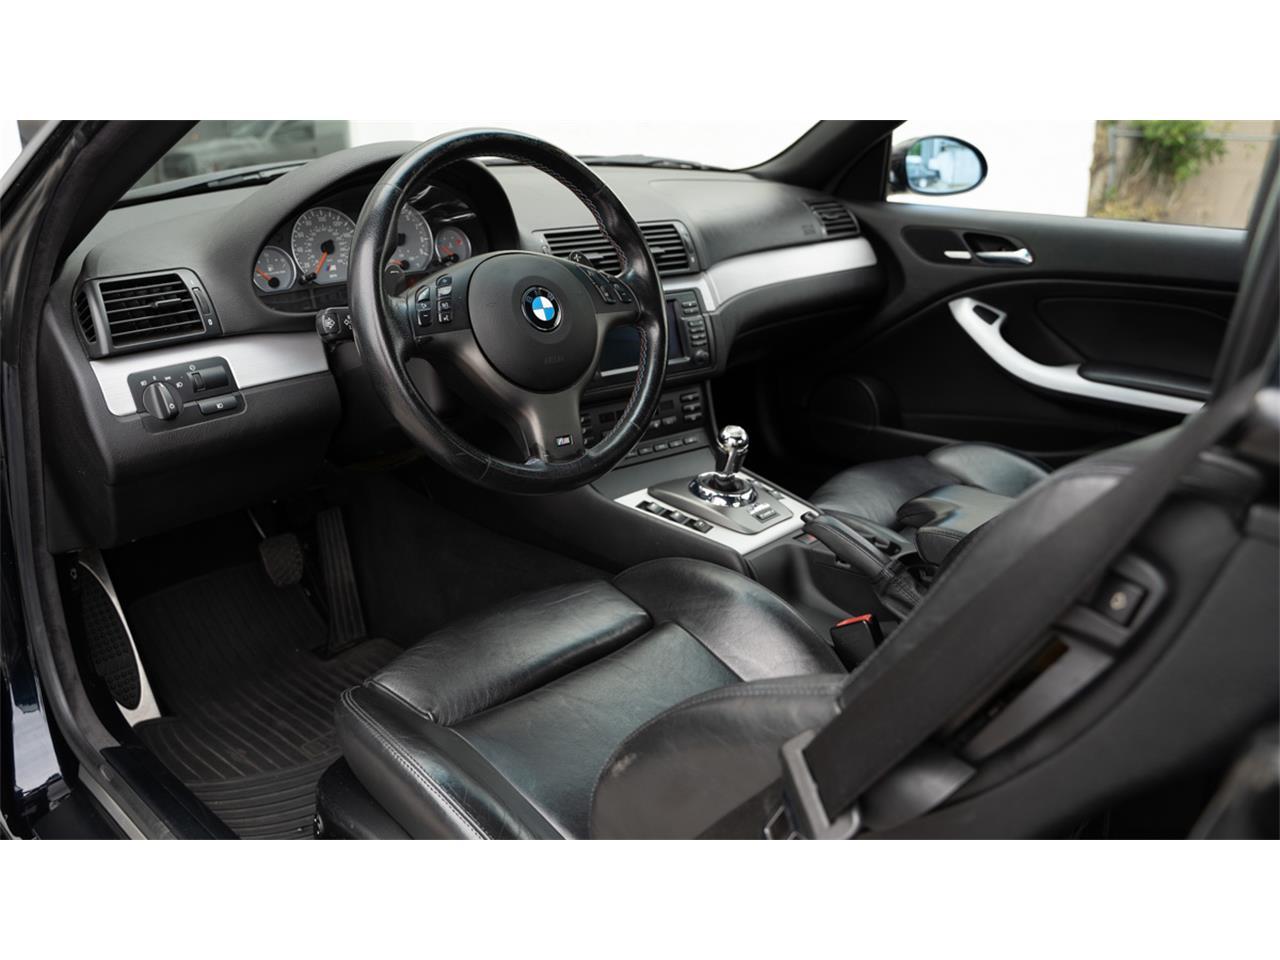 2003 BMW M3 (CC-1354988) for sale in Salt Lake City, Utah